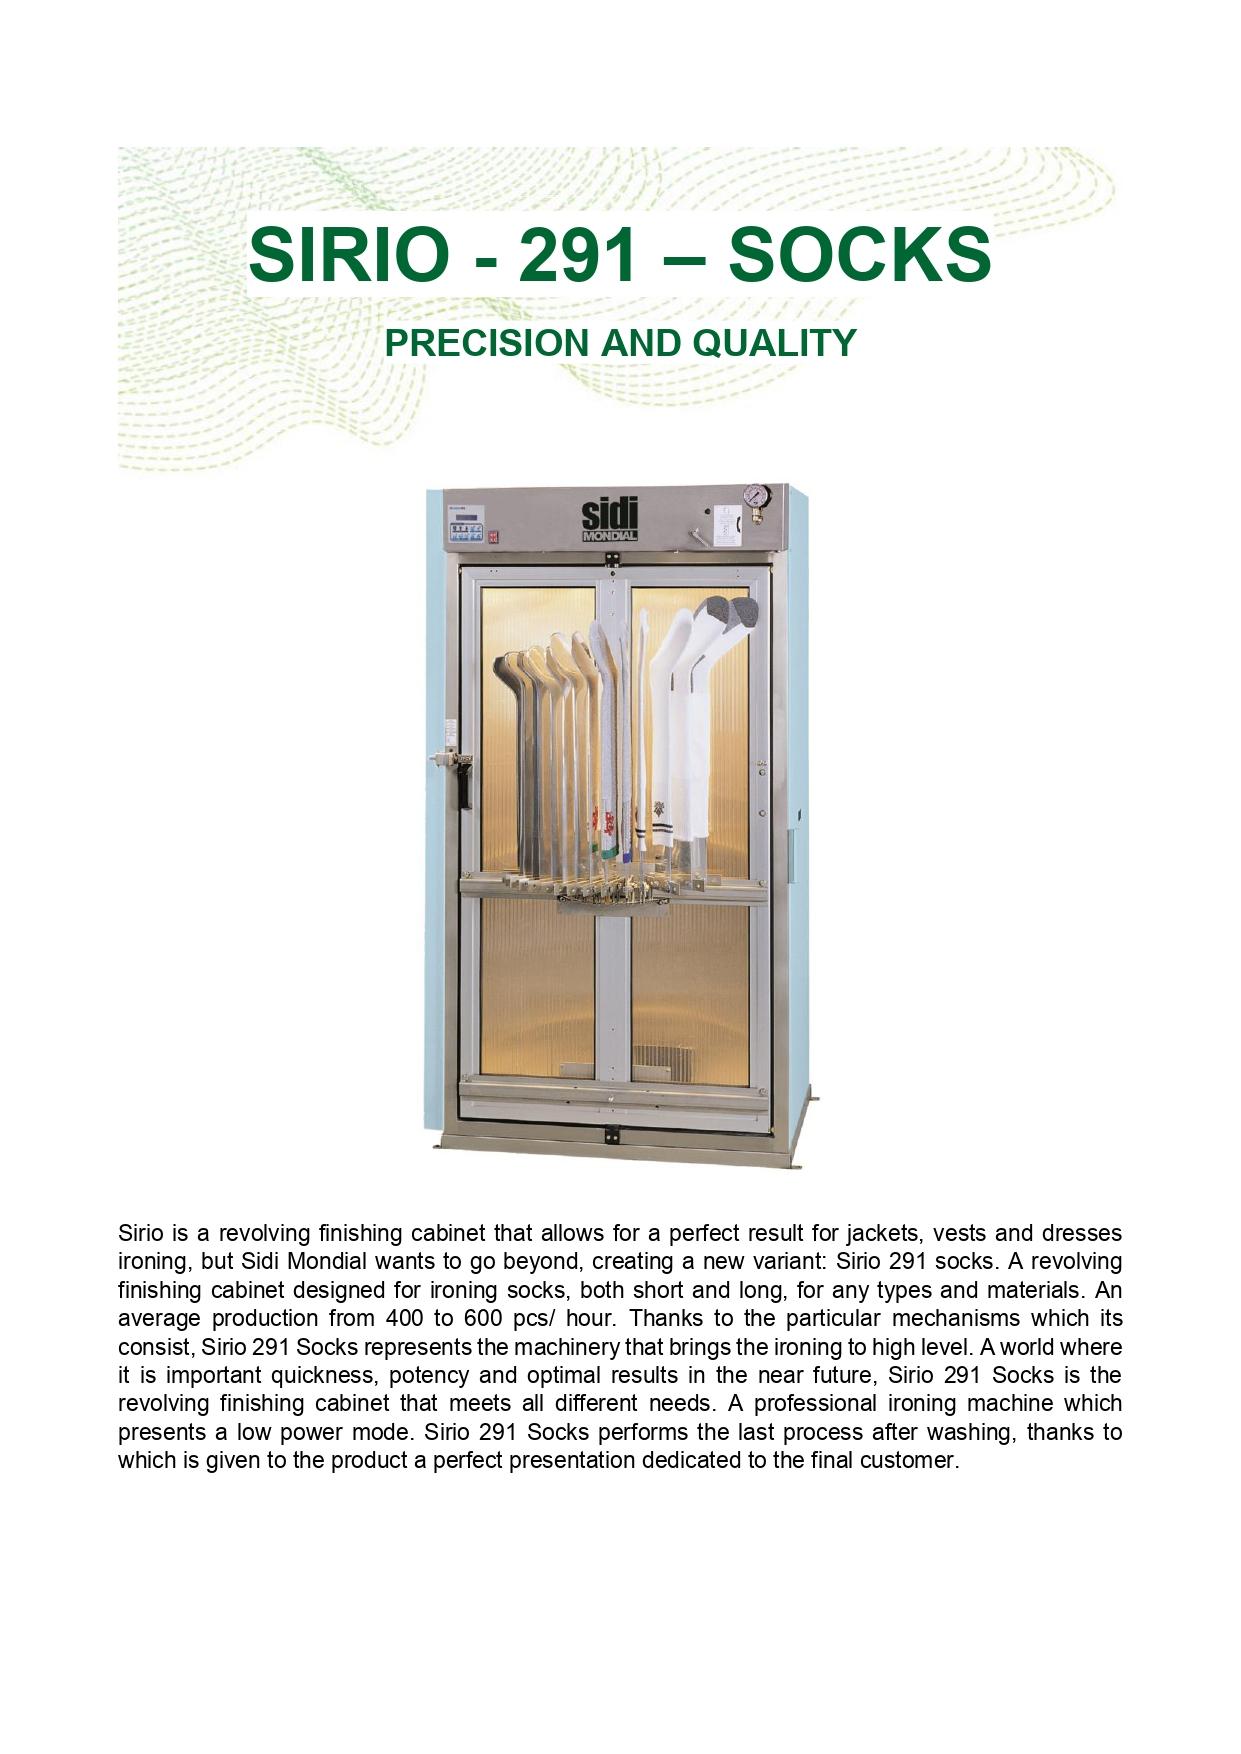 SIRIO-291-SOCKS